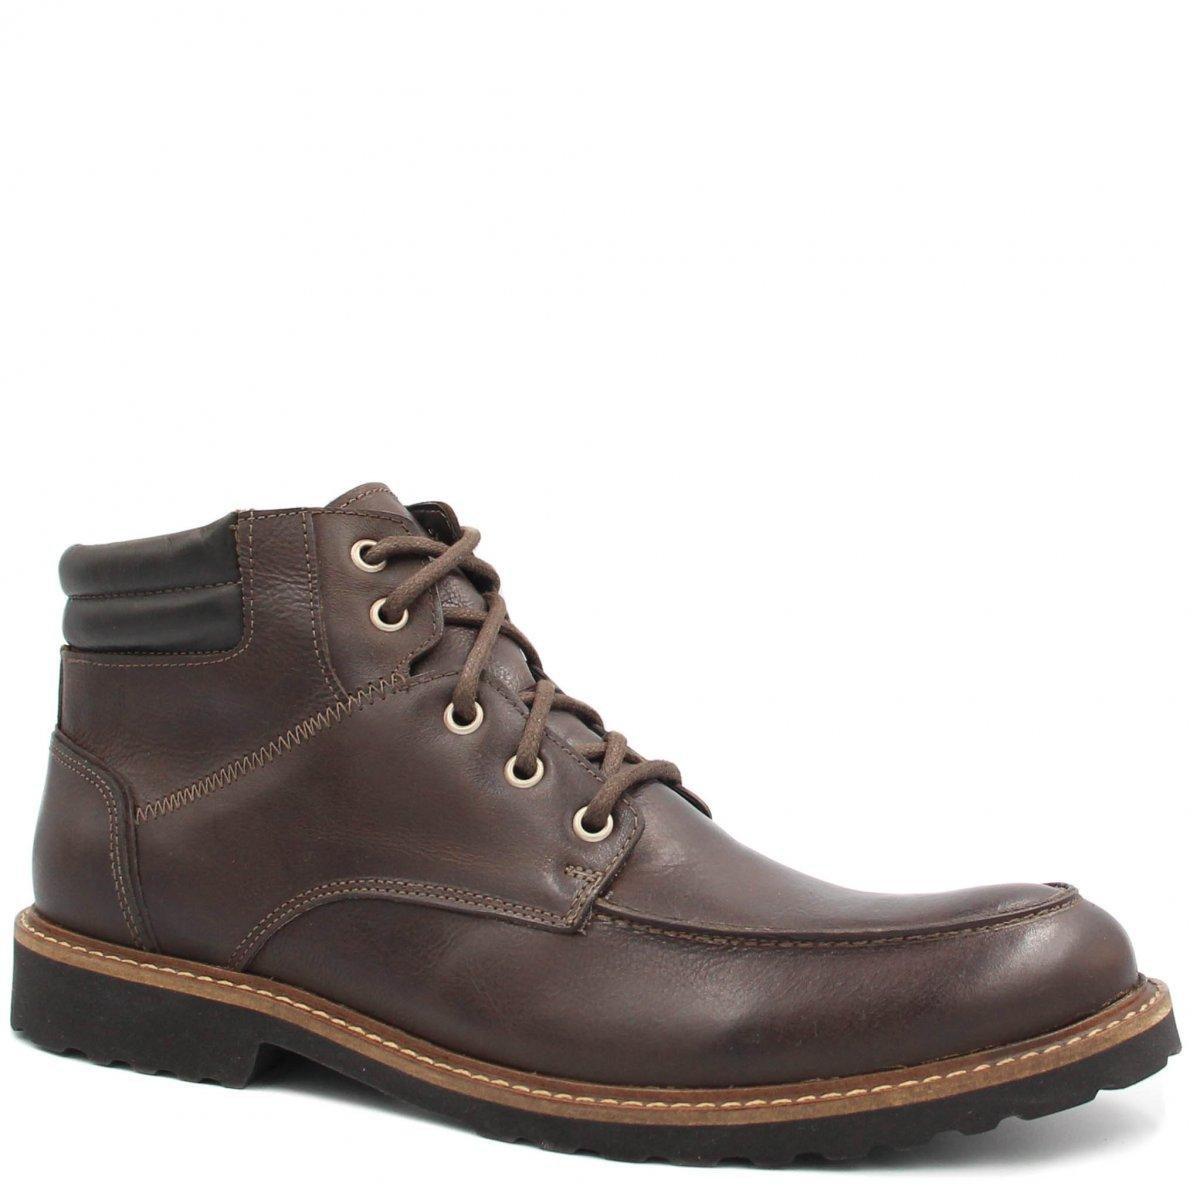 em Bota Zariff Zariff Bota Masculina Couro Shoes Escuro Coturno Marrom qwZgpnSUZ1